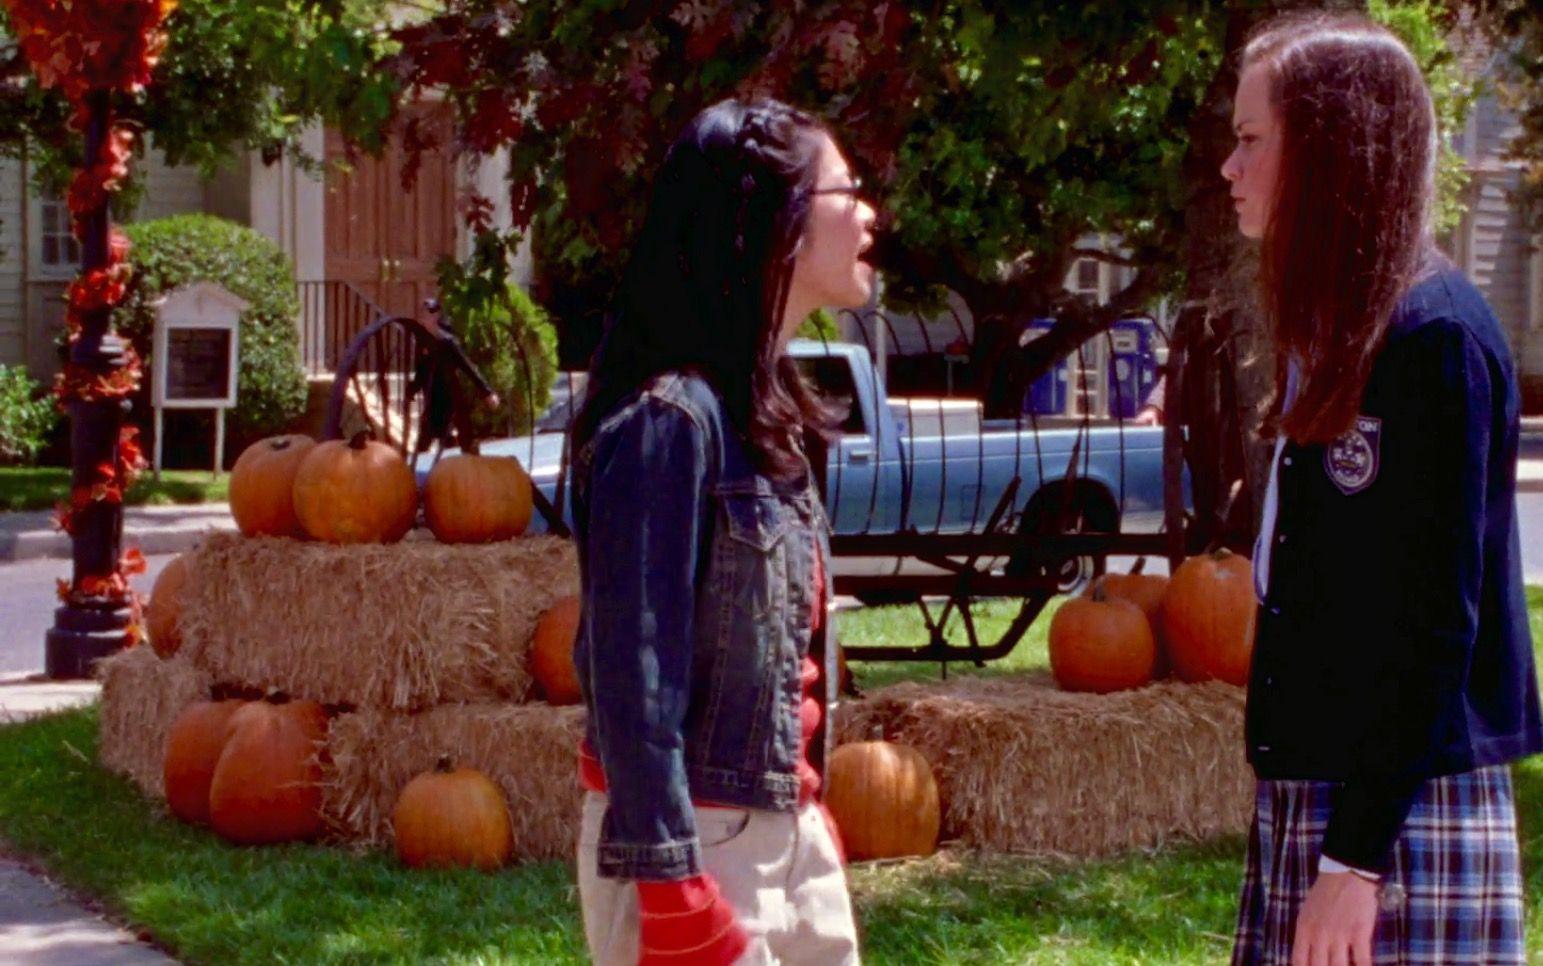 Pin by Niya on Fall Gilmore girls, Pumpkin patch, Fall